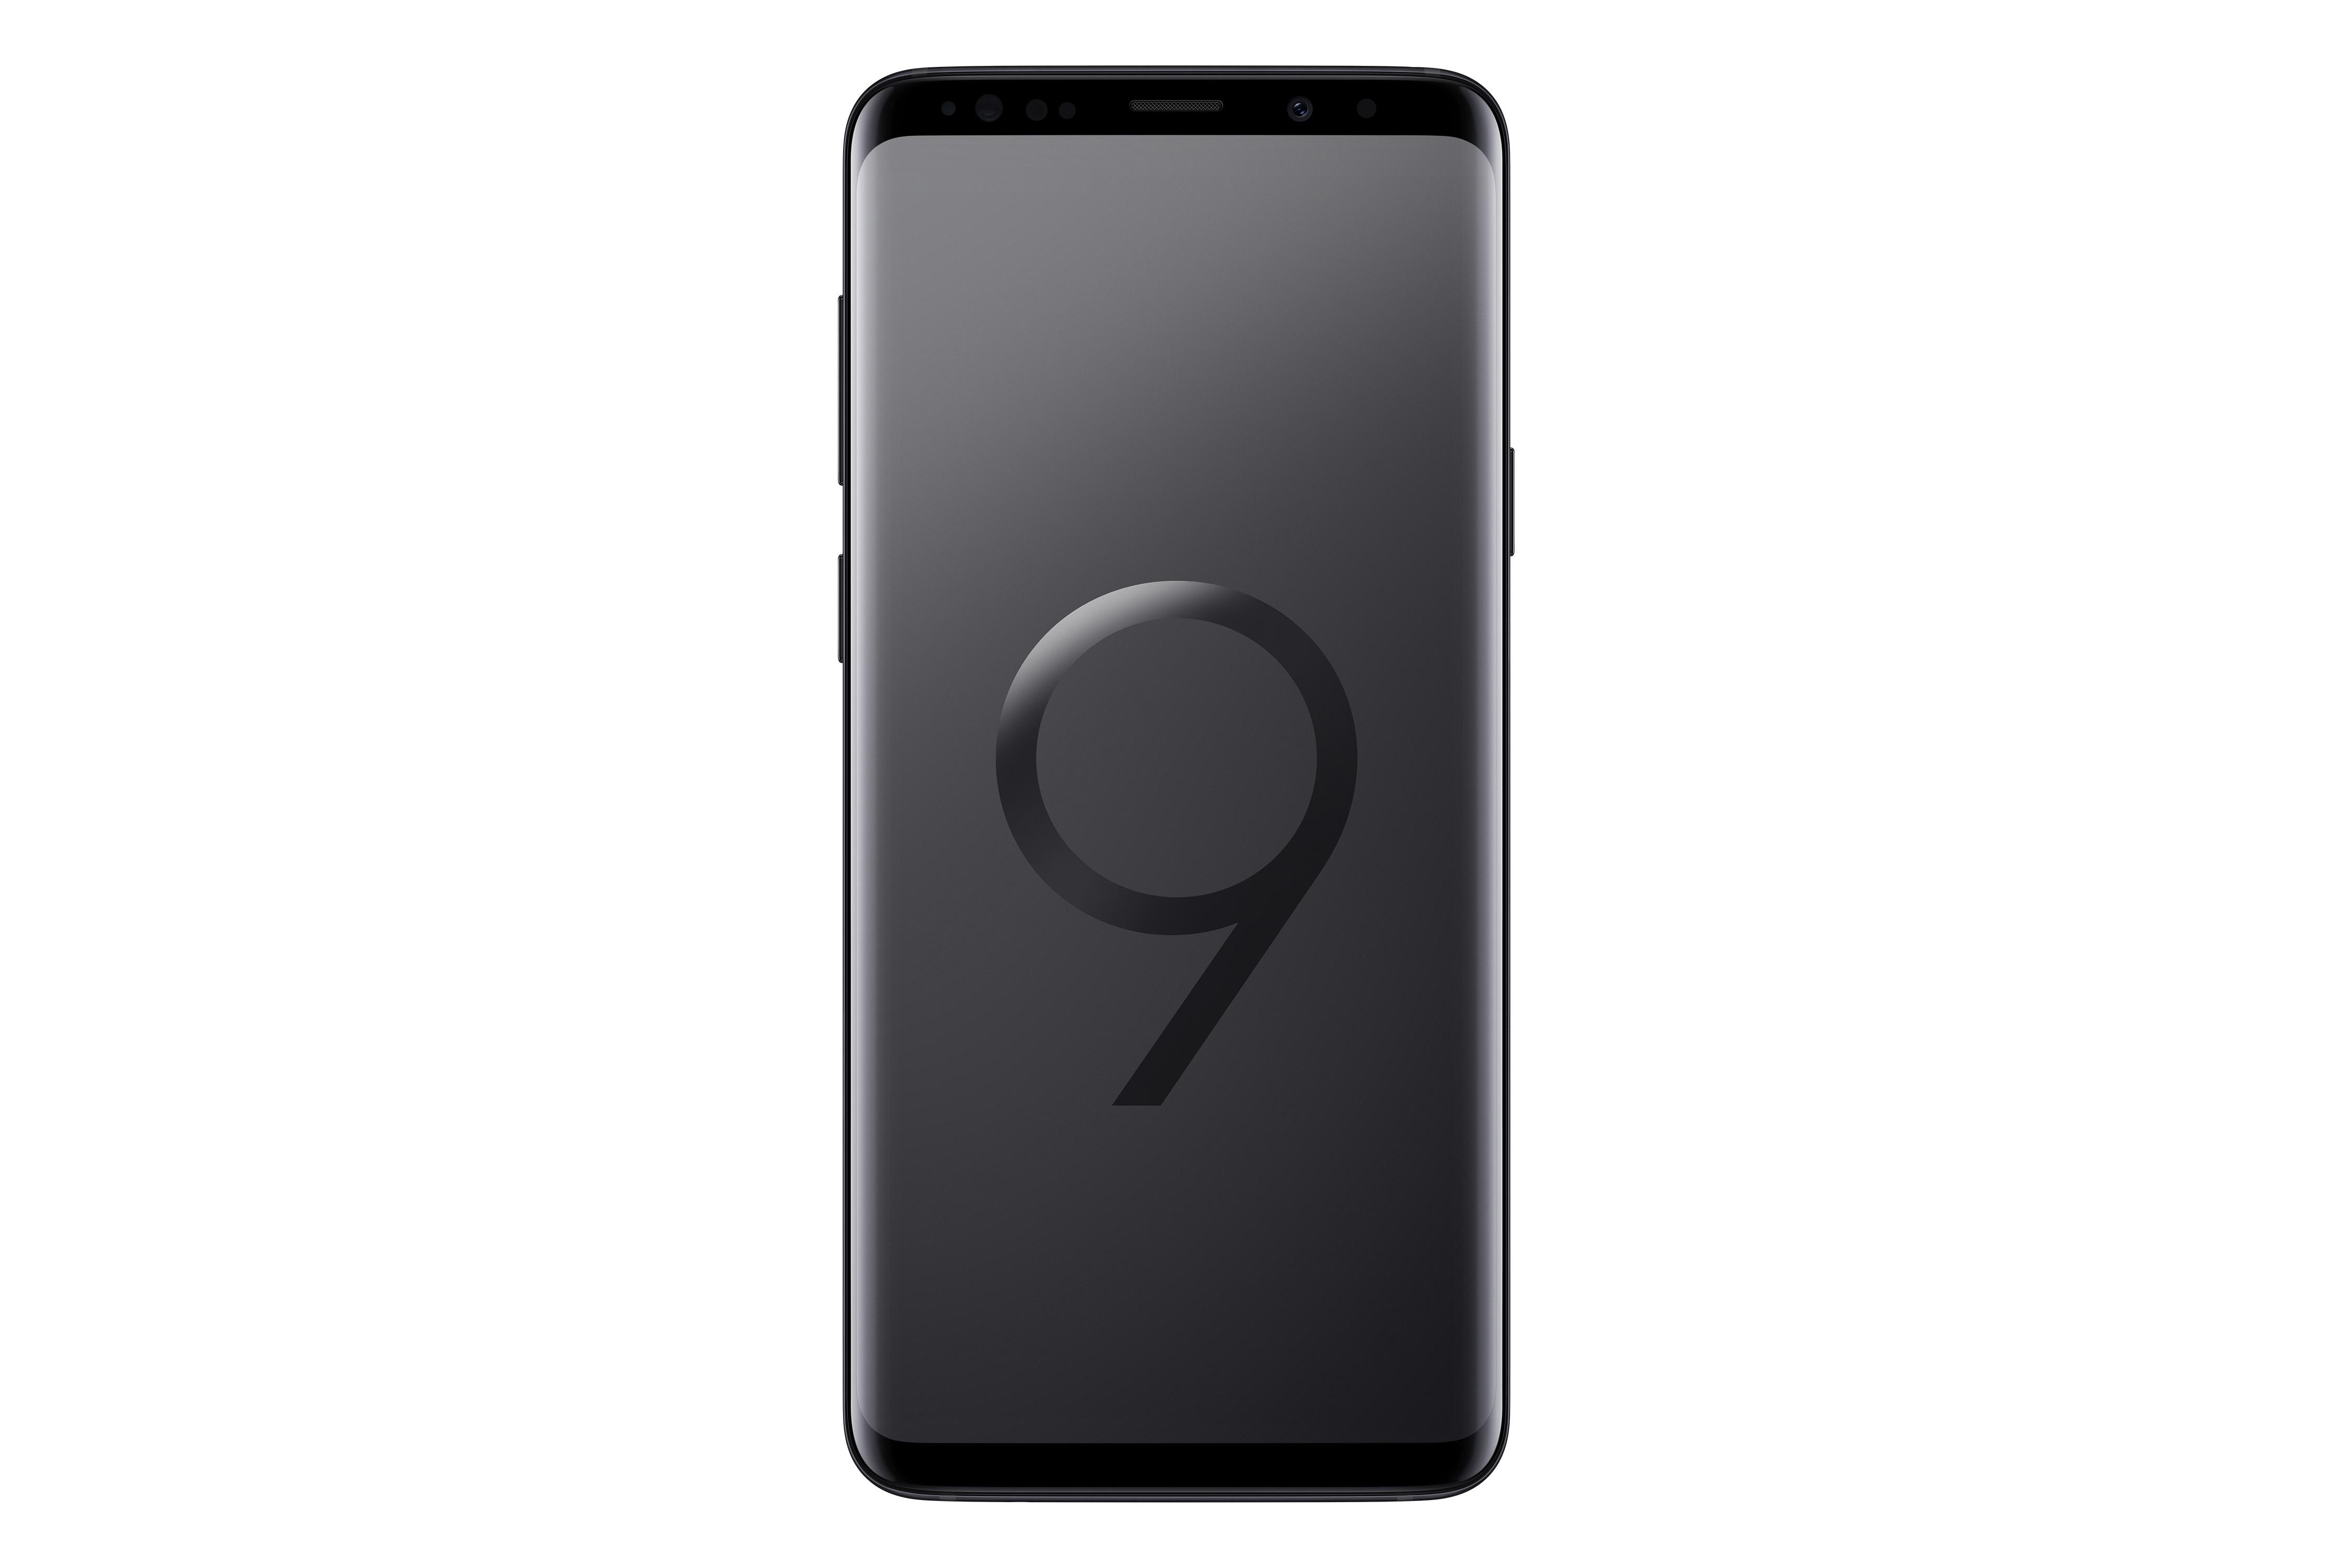 Samsung Galaxy S9+ product image